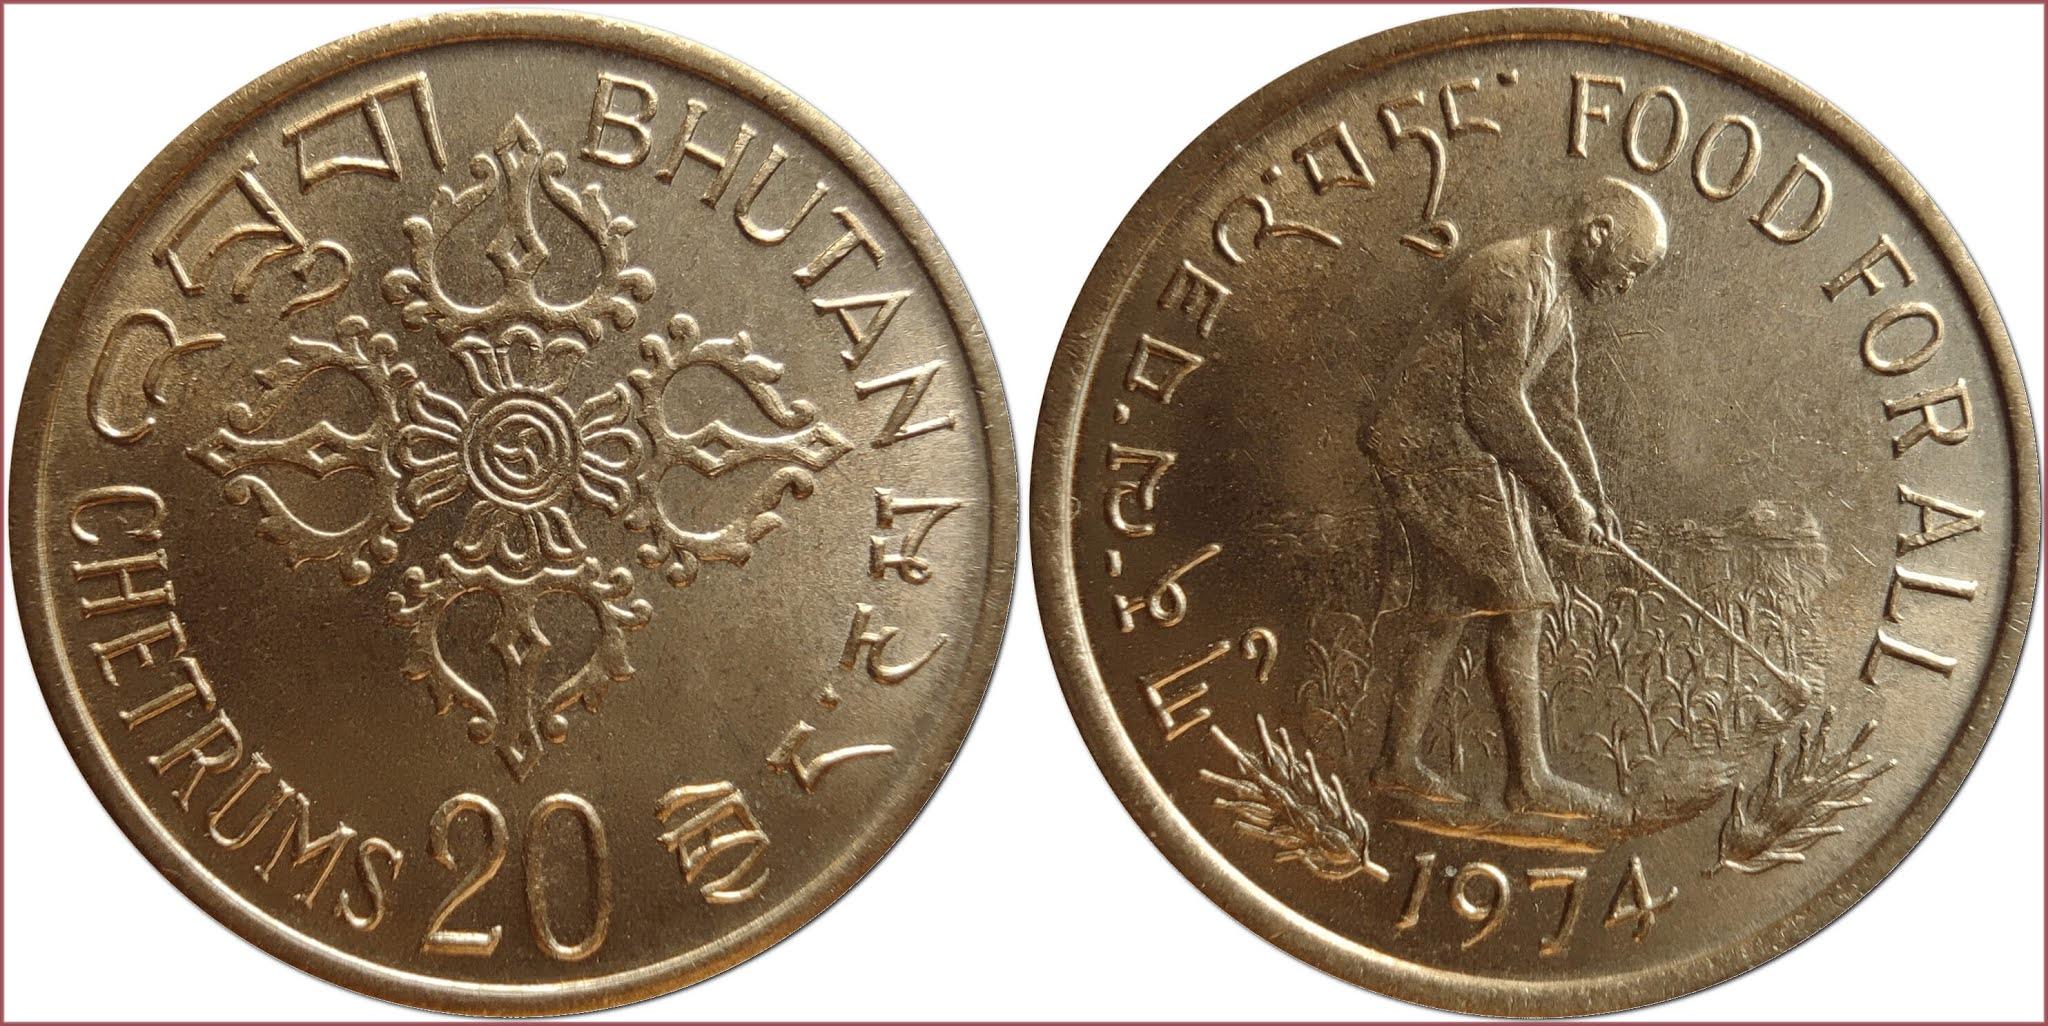 20 chetrum, 1974: Kingdom of Bhutan